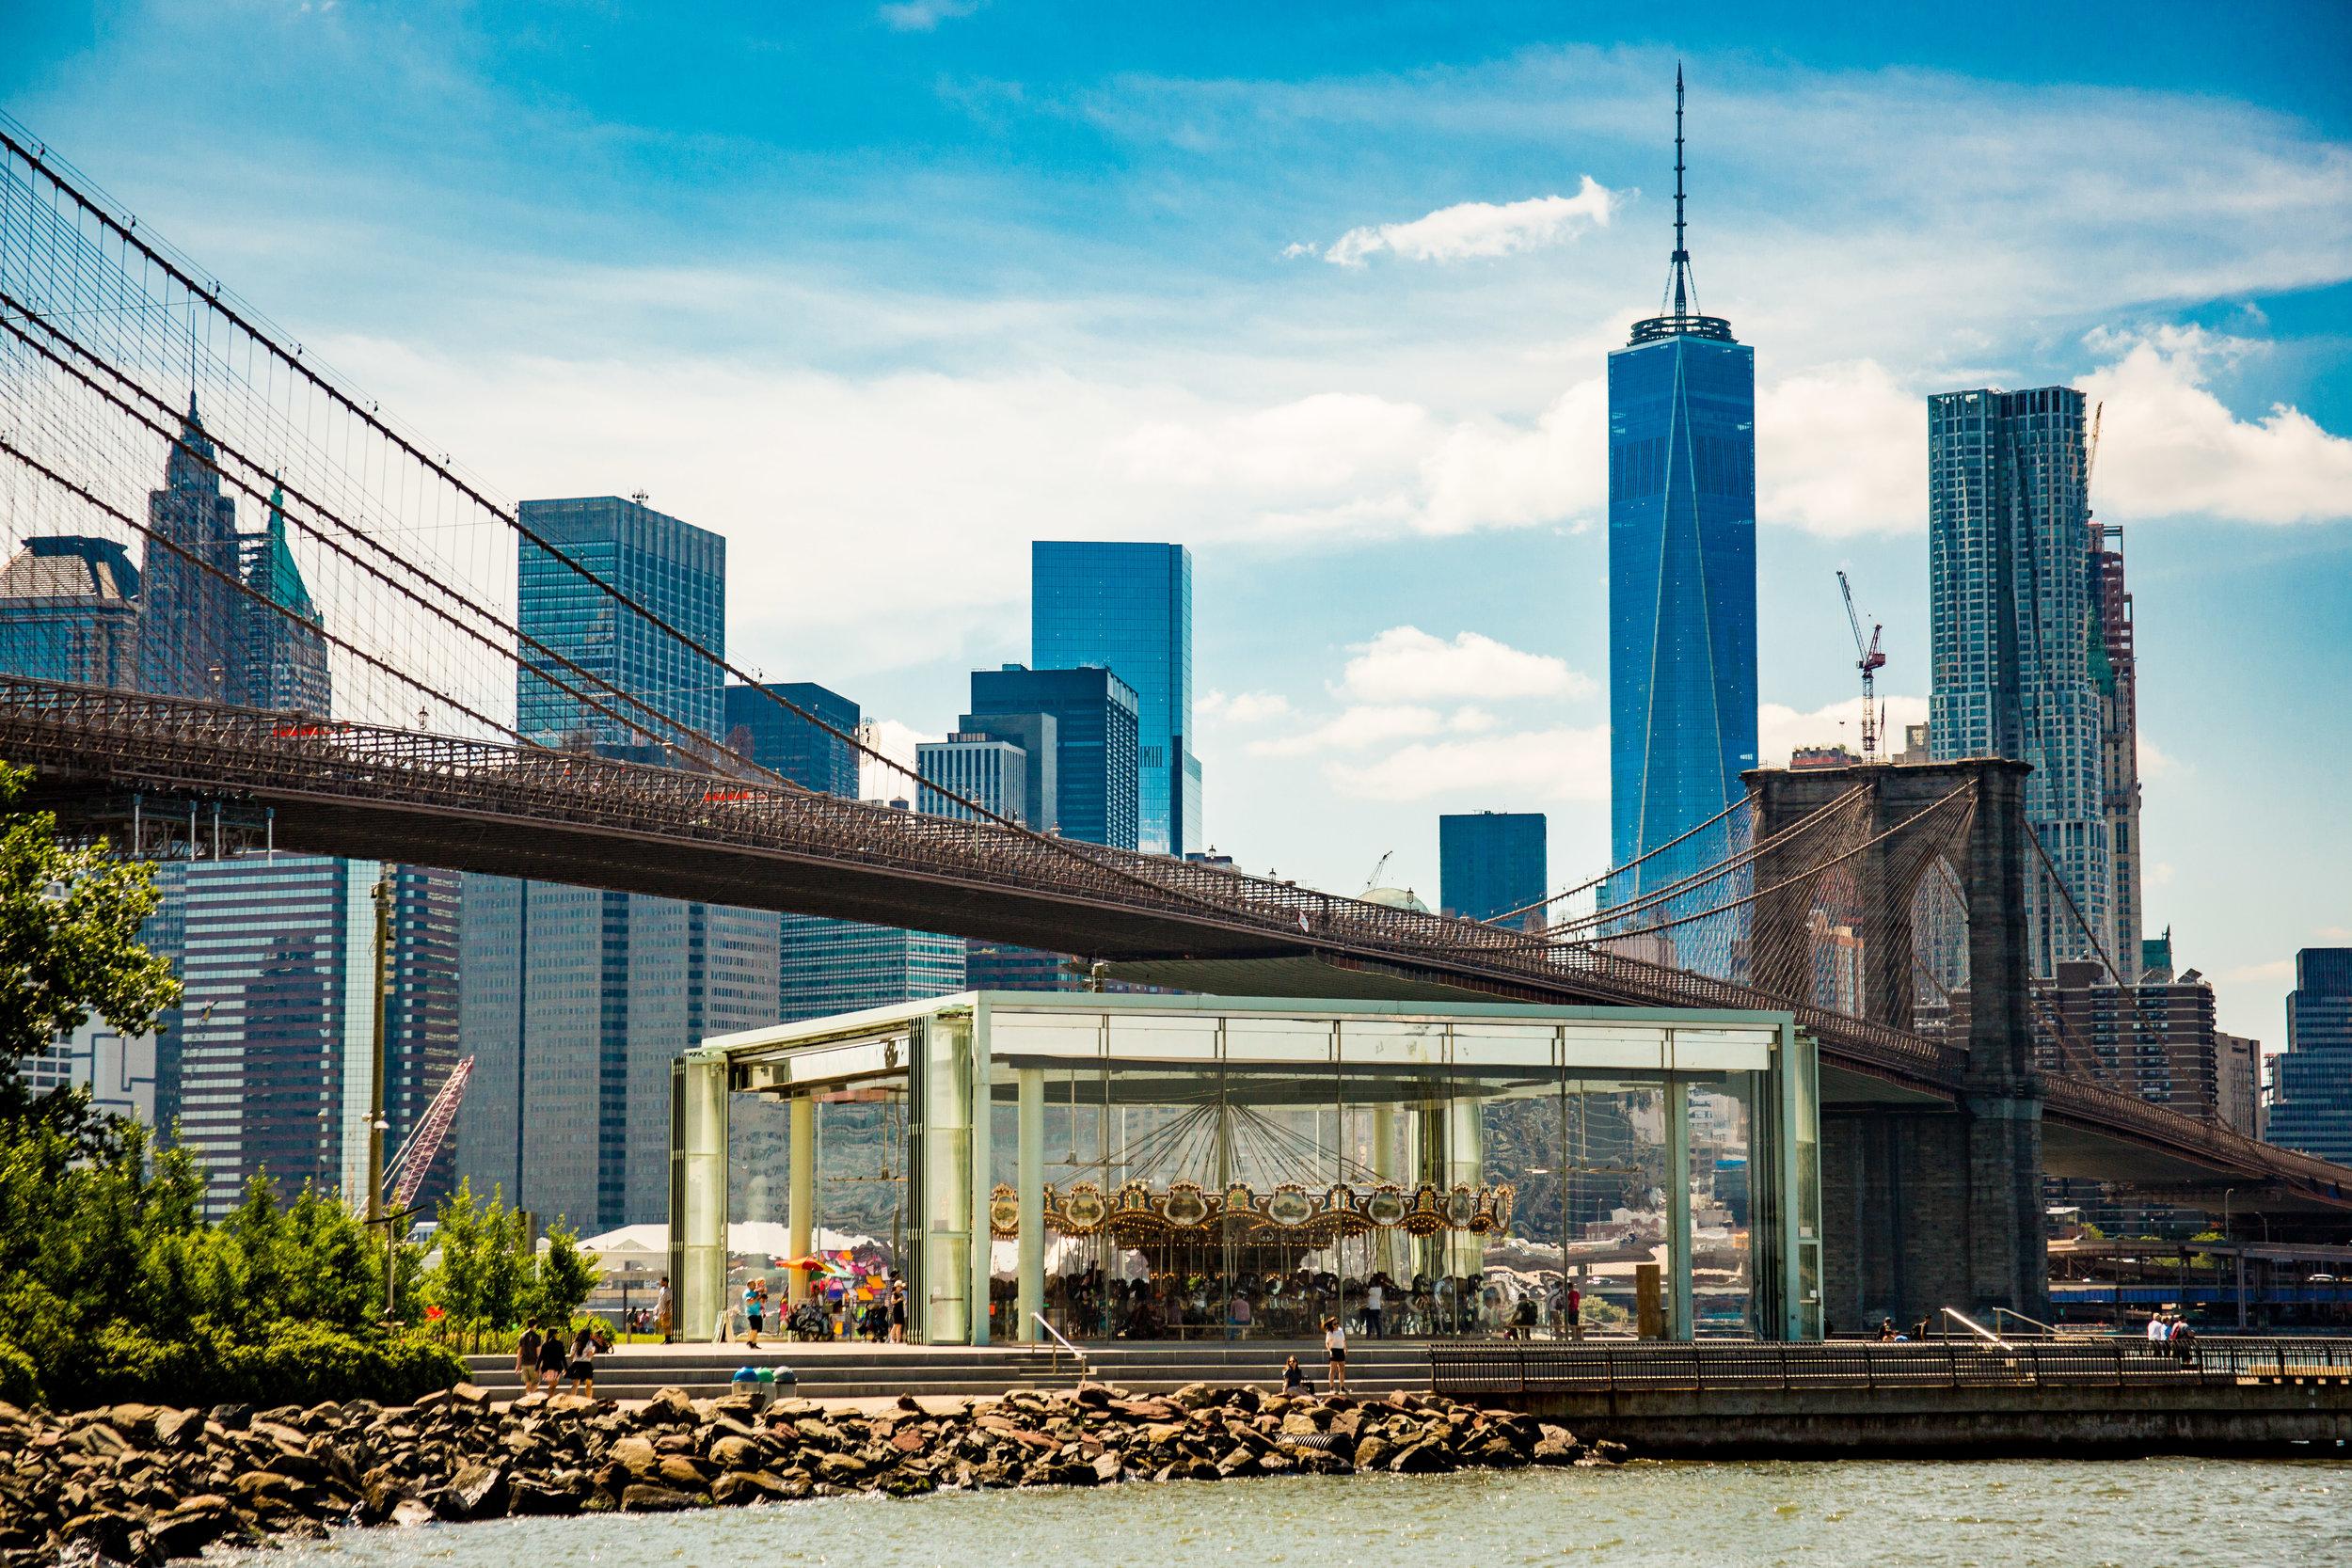 LSNY_Brooklyn_Bridge_Park-31.jpg